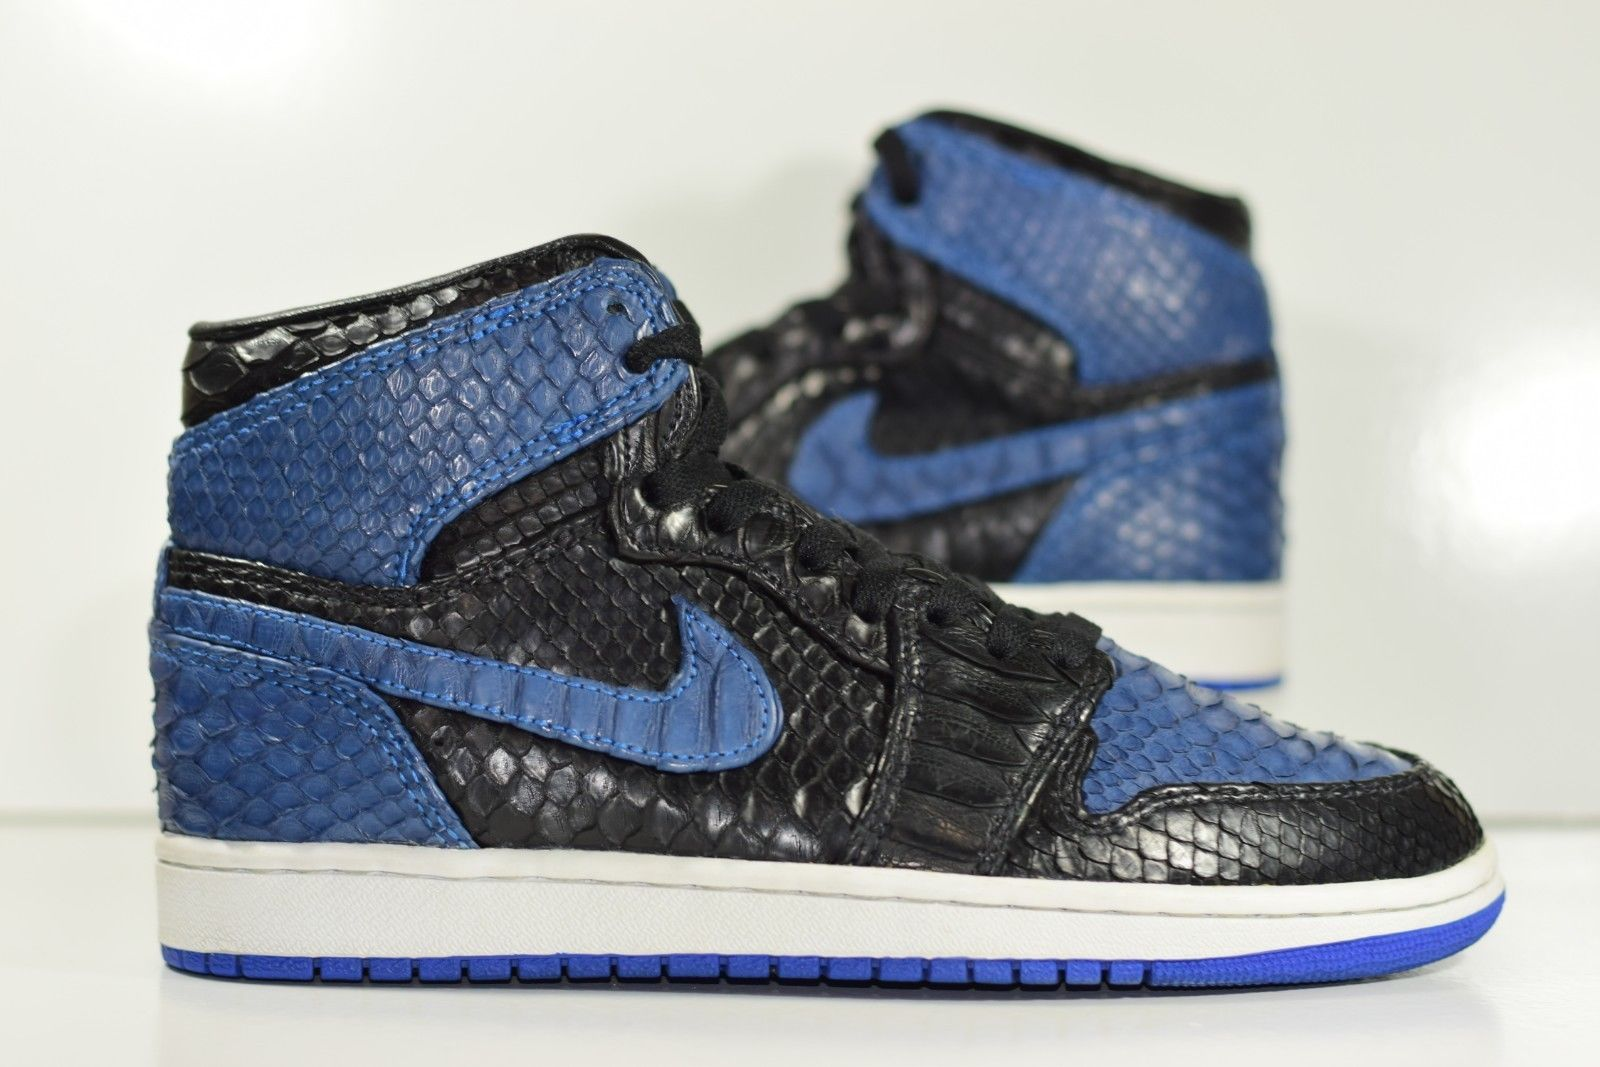 super popular cc499 82589 Size 8.5   2013 Nike Air Jordan 1 Retro High OG Royal X JBF Customs PYTHON  ...